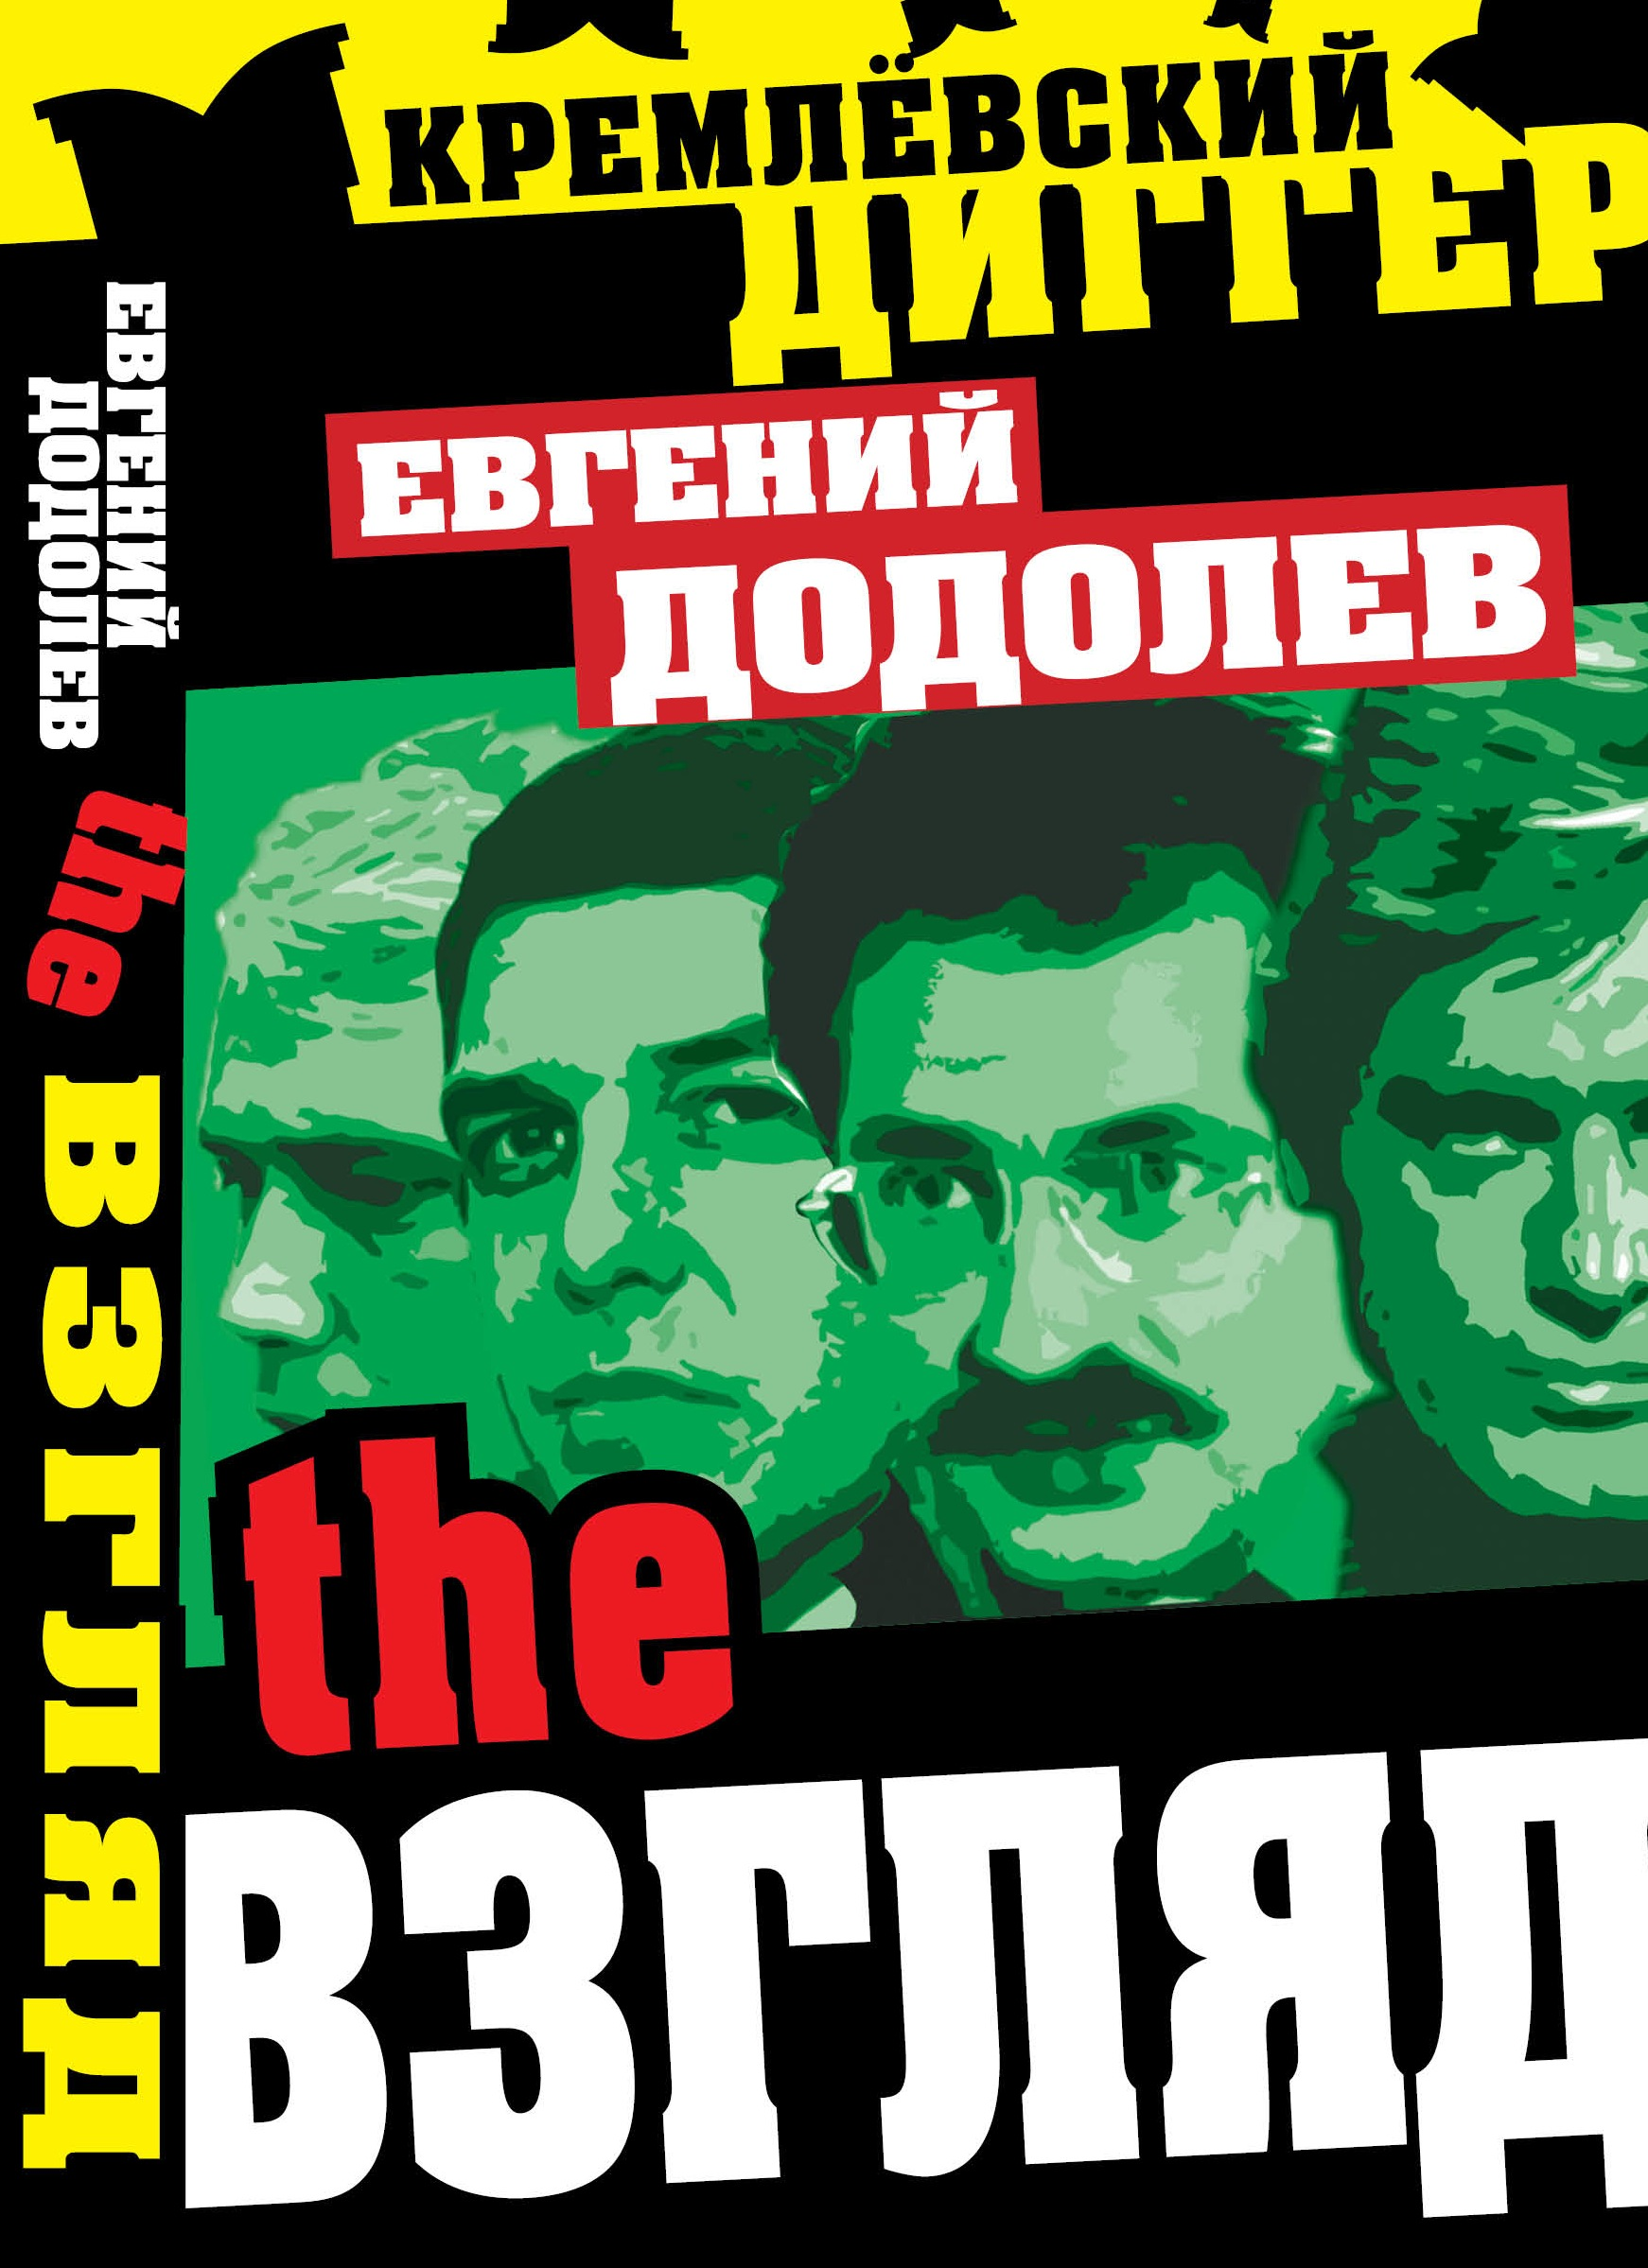 Додолев_THE Взгляд_01